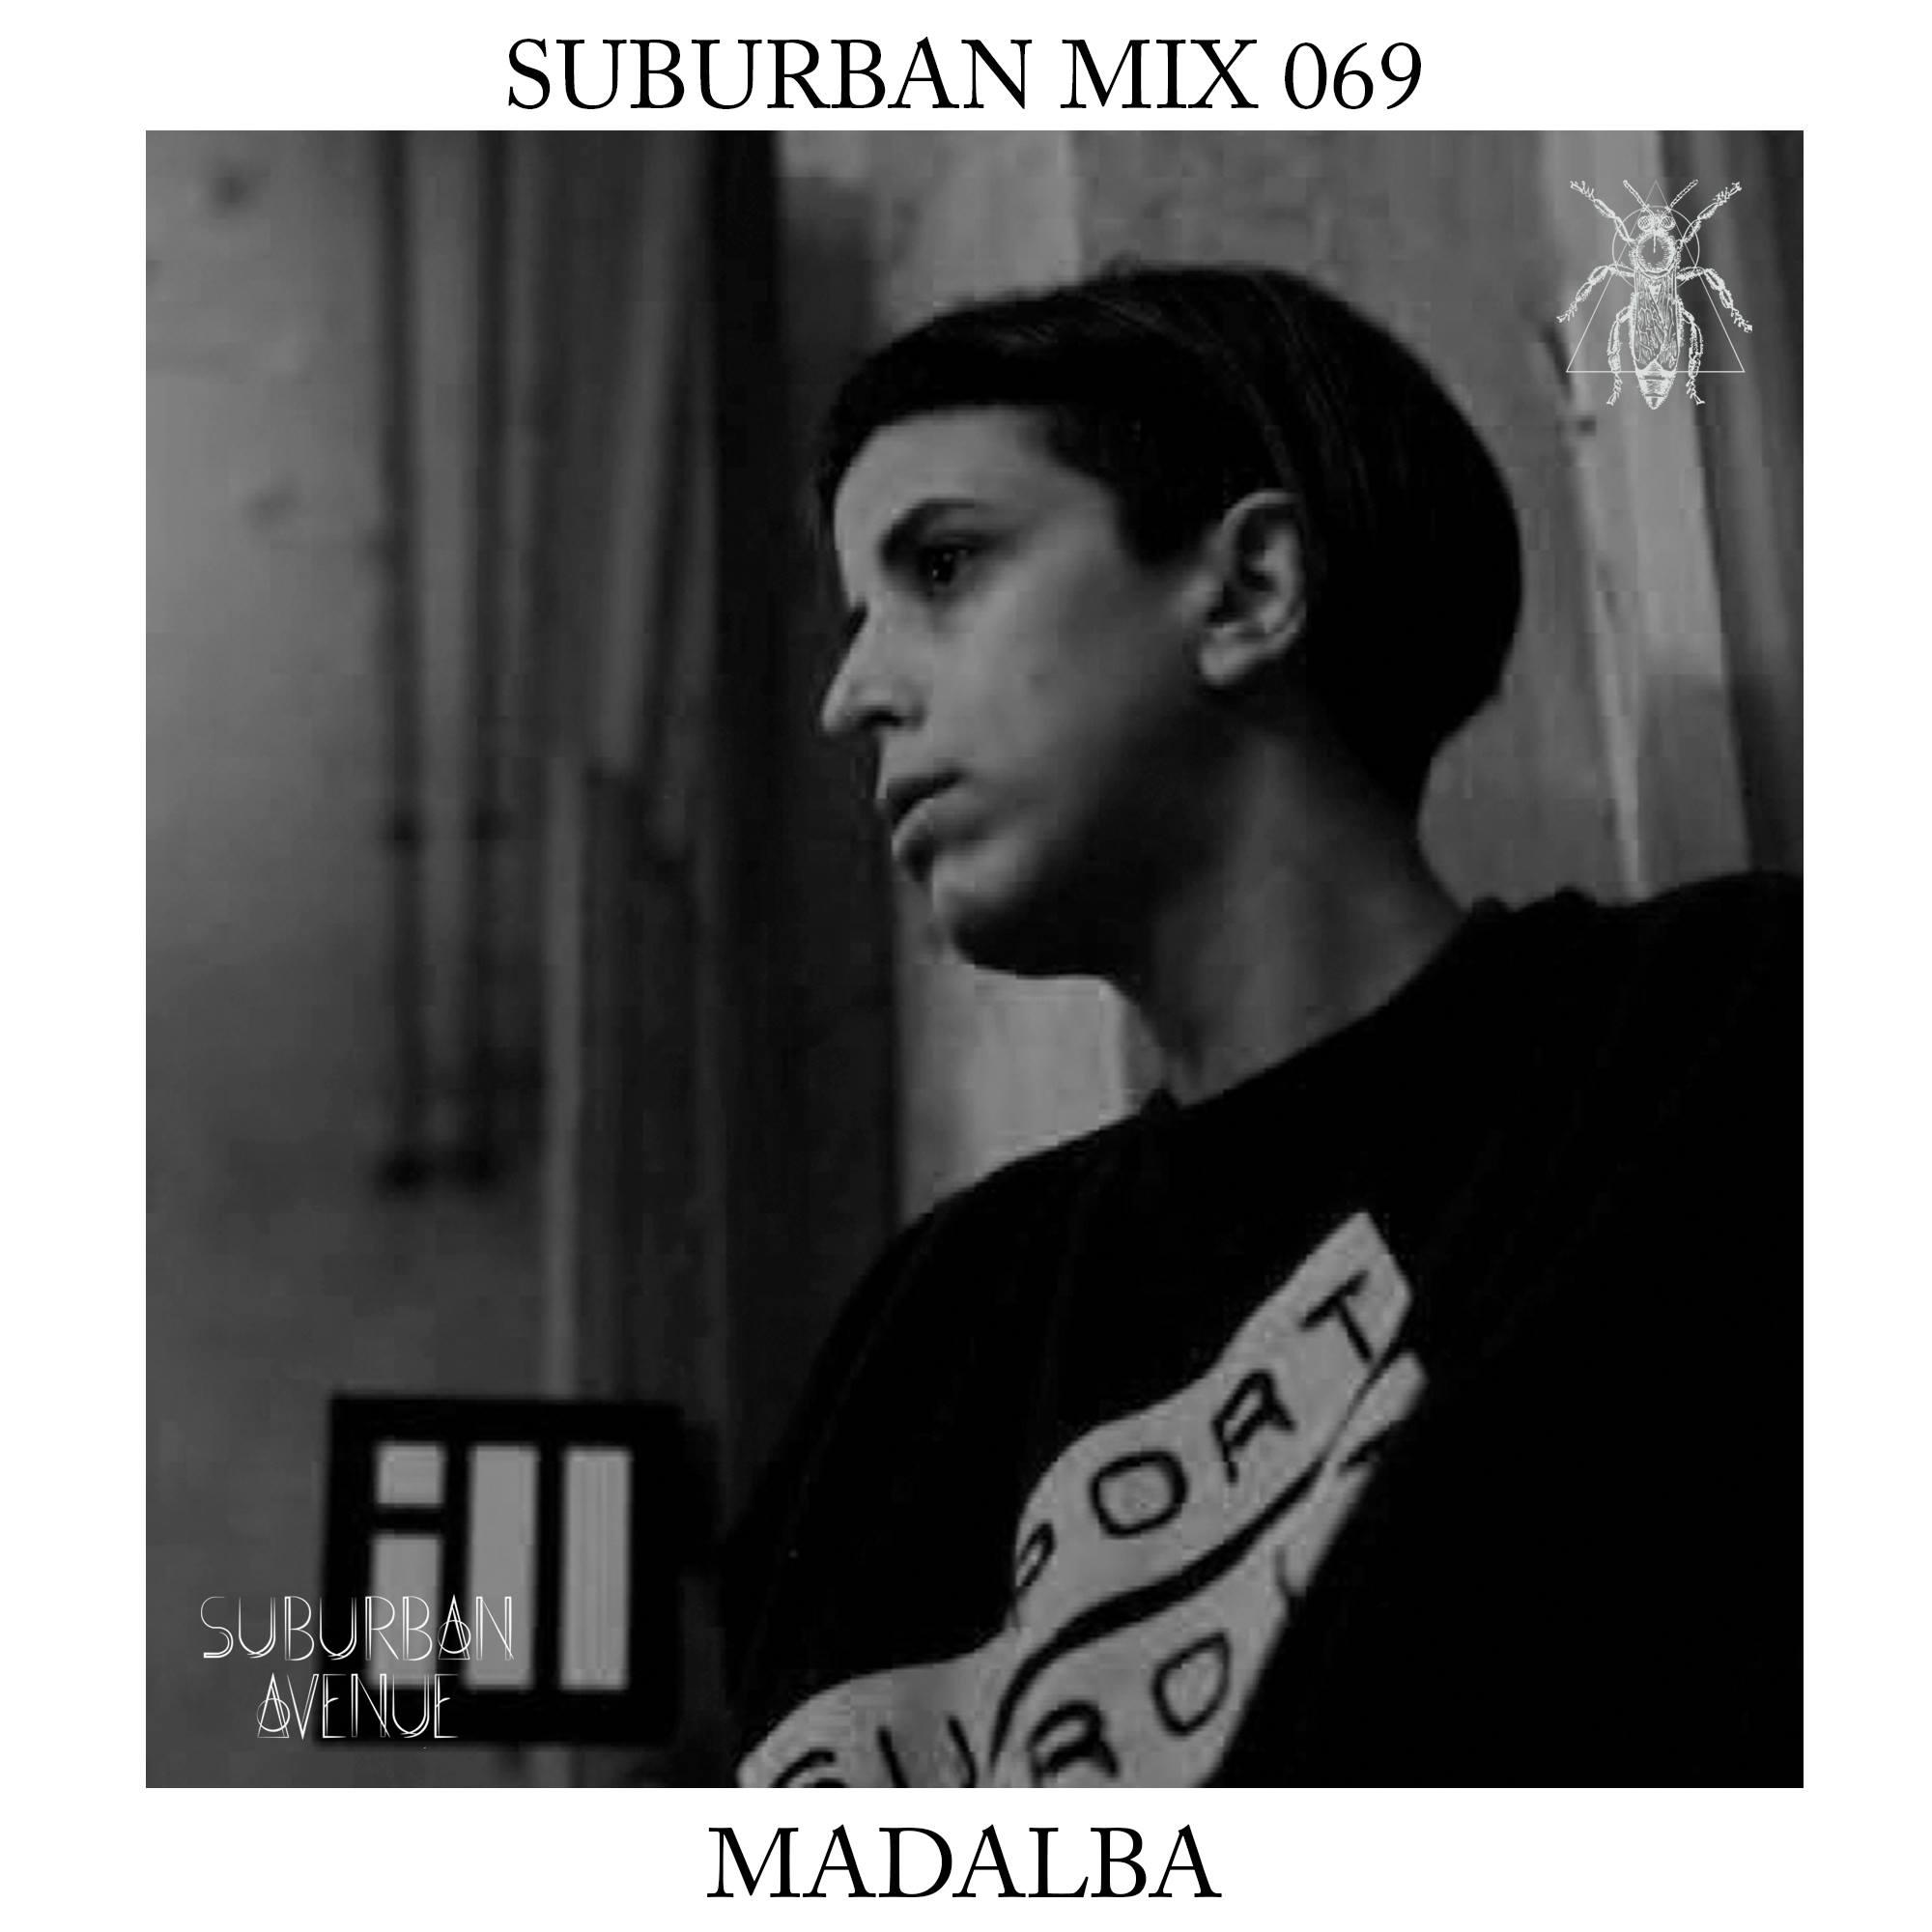 Suburban Mix 069 - Madalba